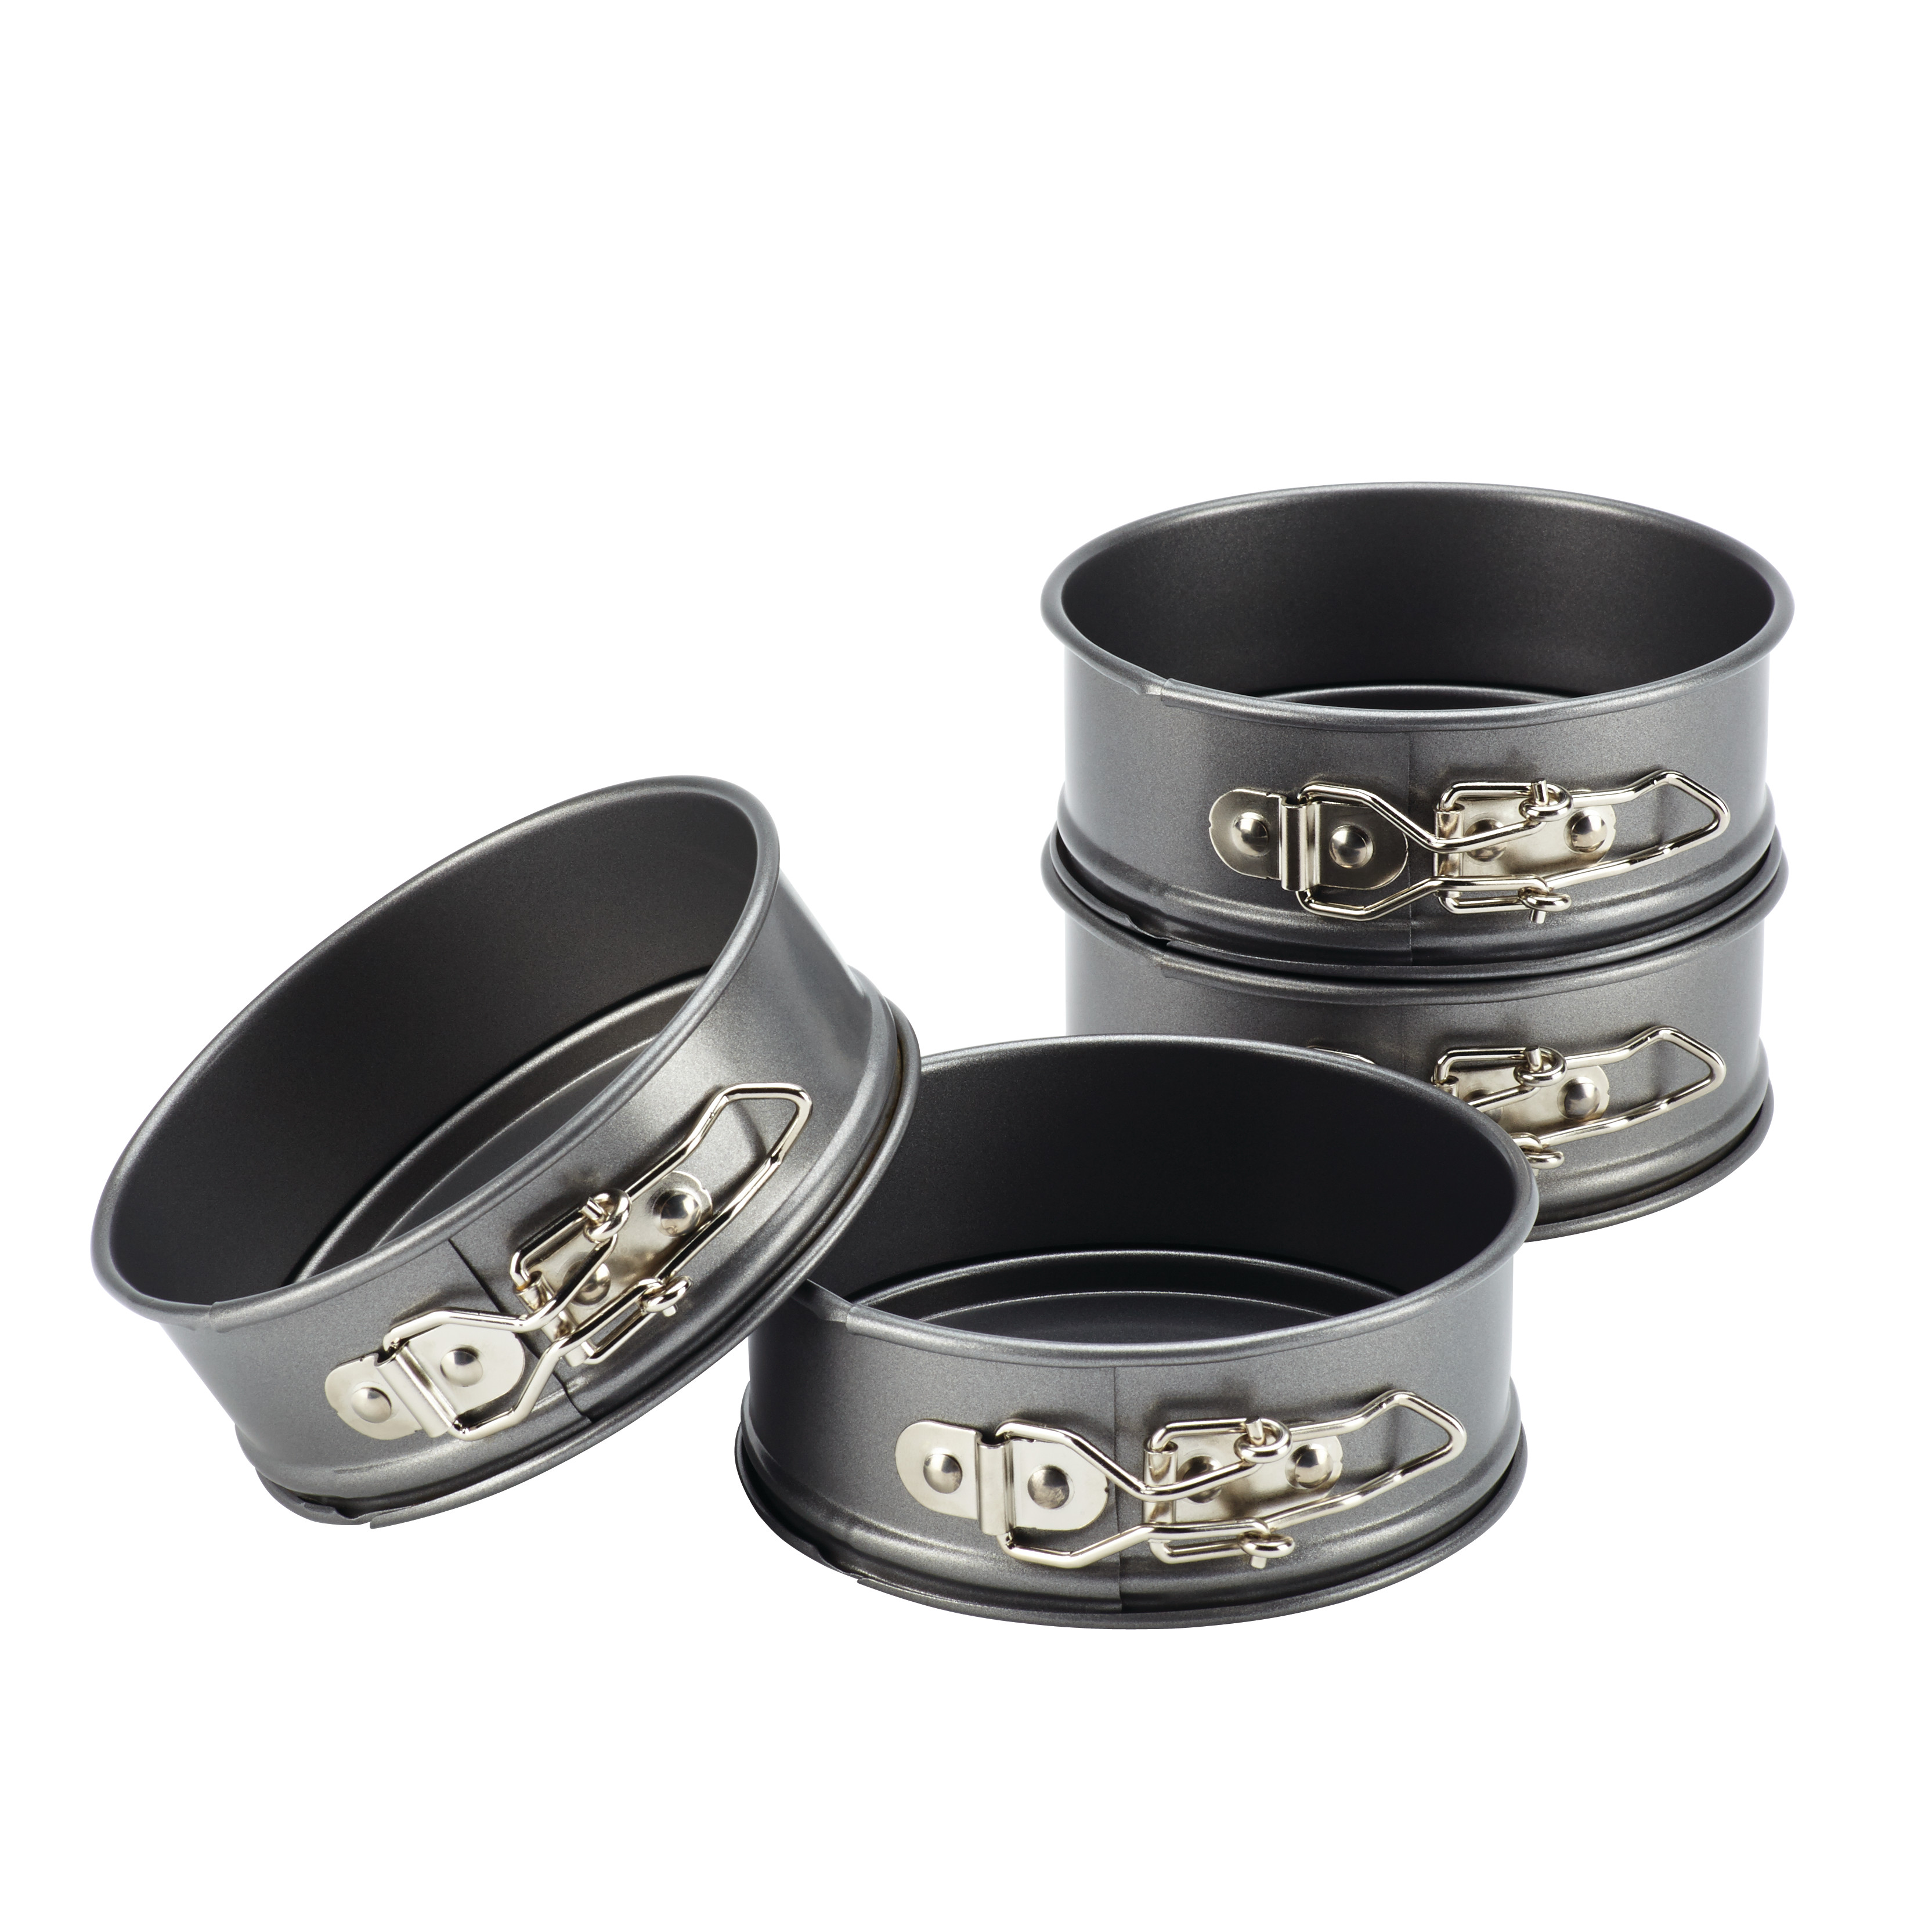 Cake Boss Novelty Bakeware 4-Piece Nonstick Mini Springform Pan Set, Gray